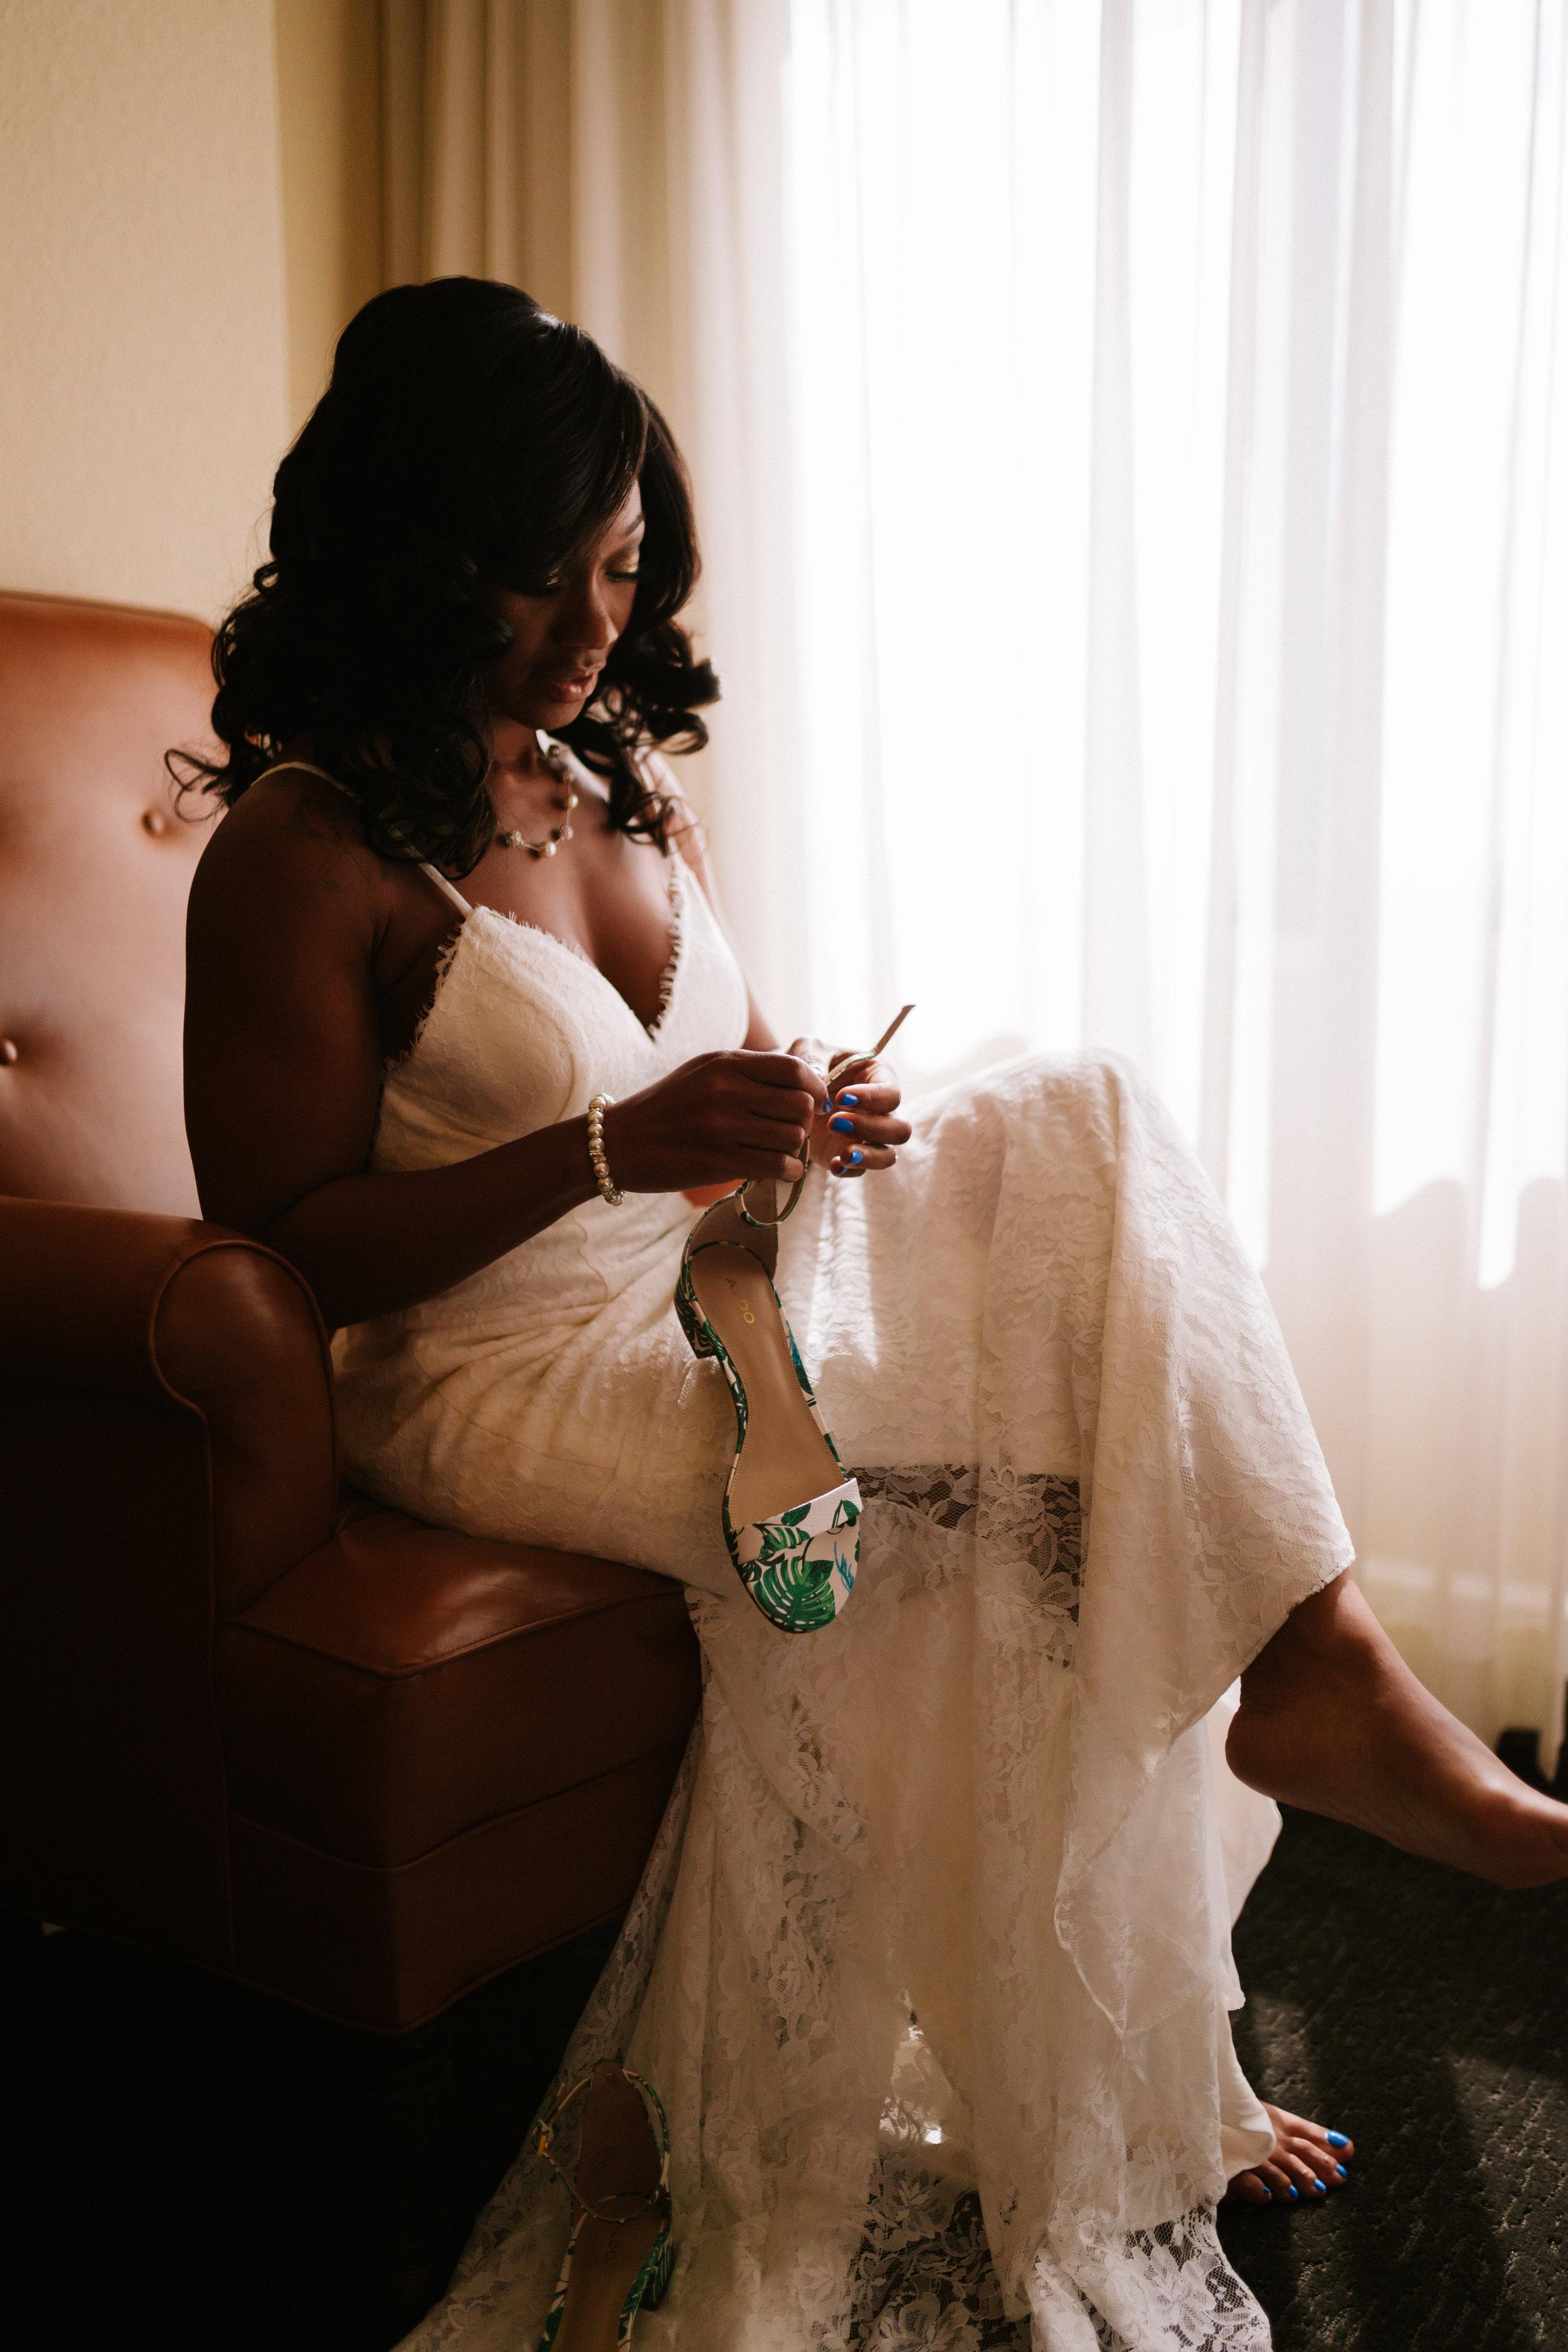 2017.09.16 Ashley and Chuck O'Day Quantam Leap Winery Wedding (76 of 462).jpg